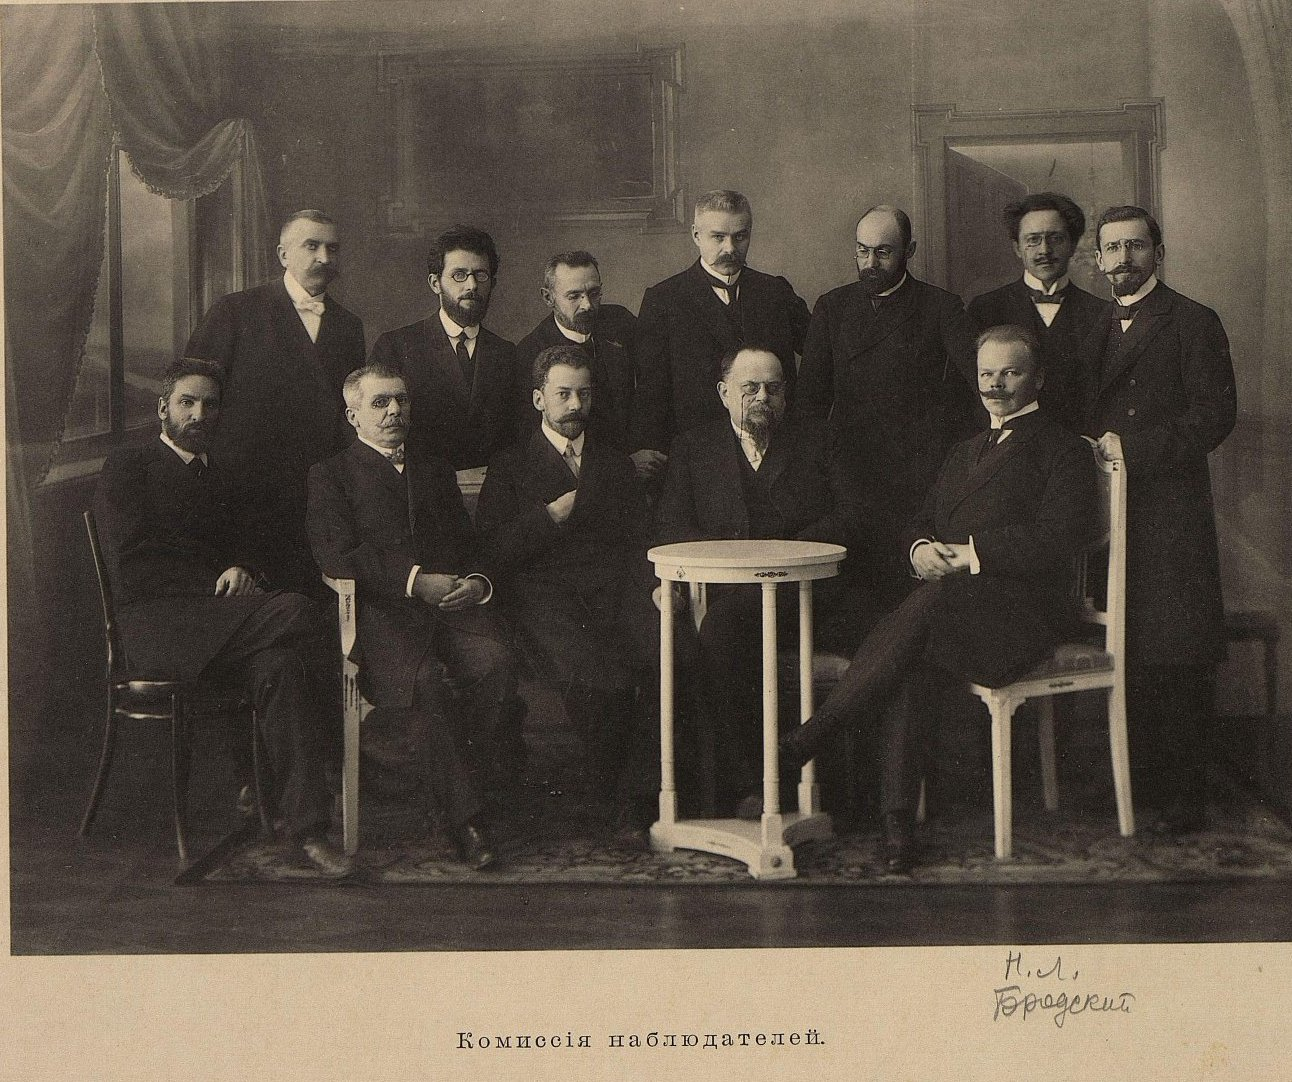 24. Комиссия наблюдателей